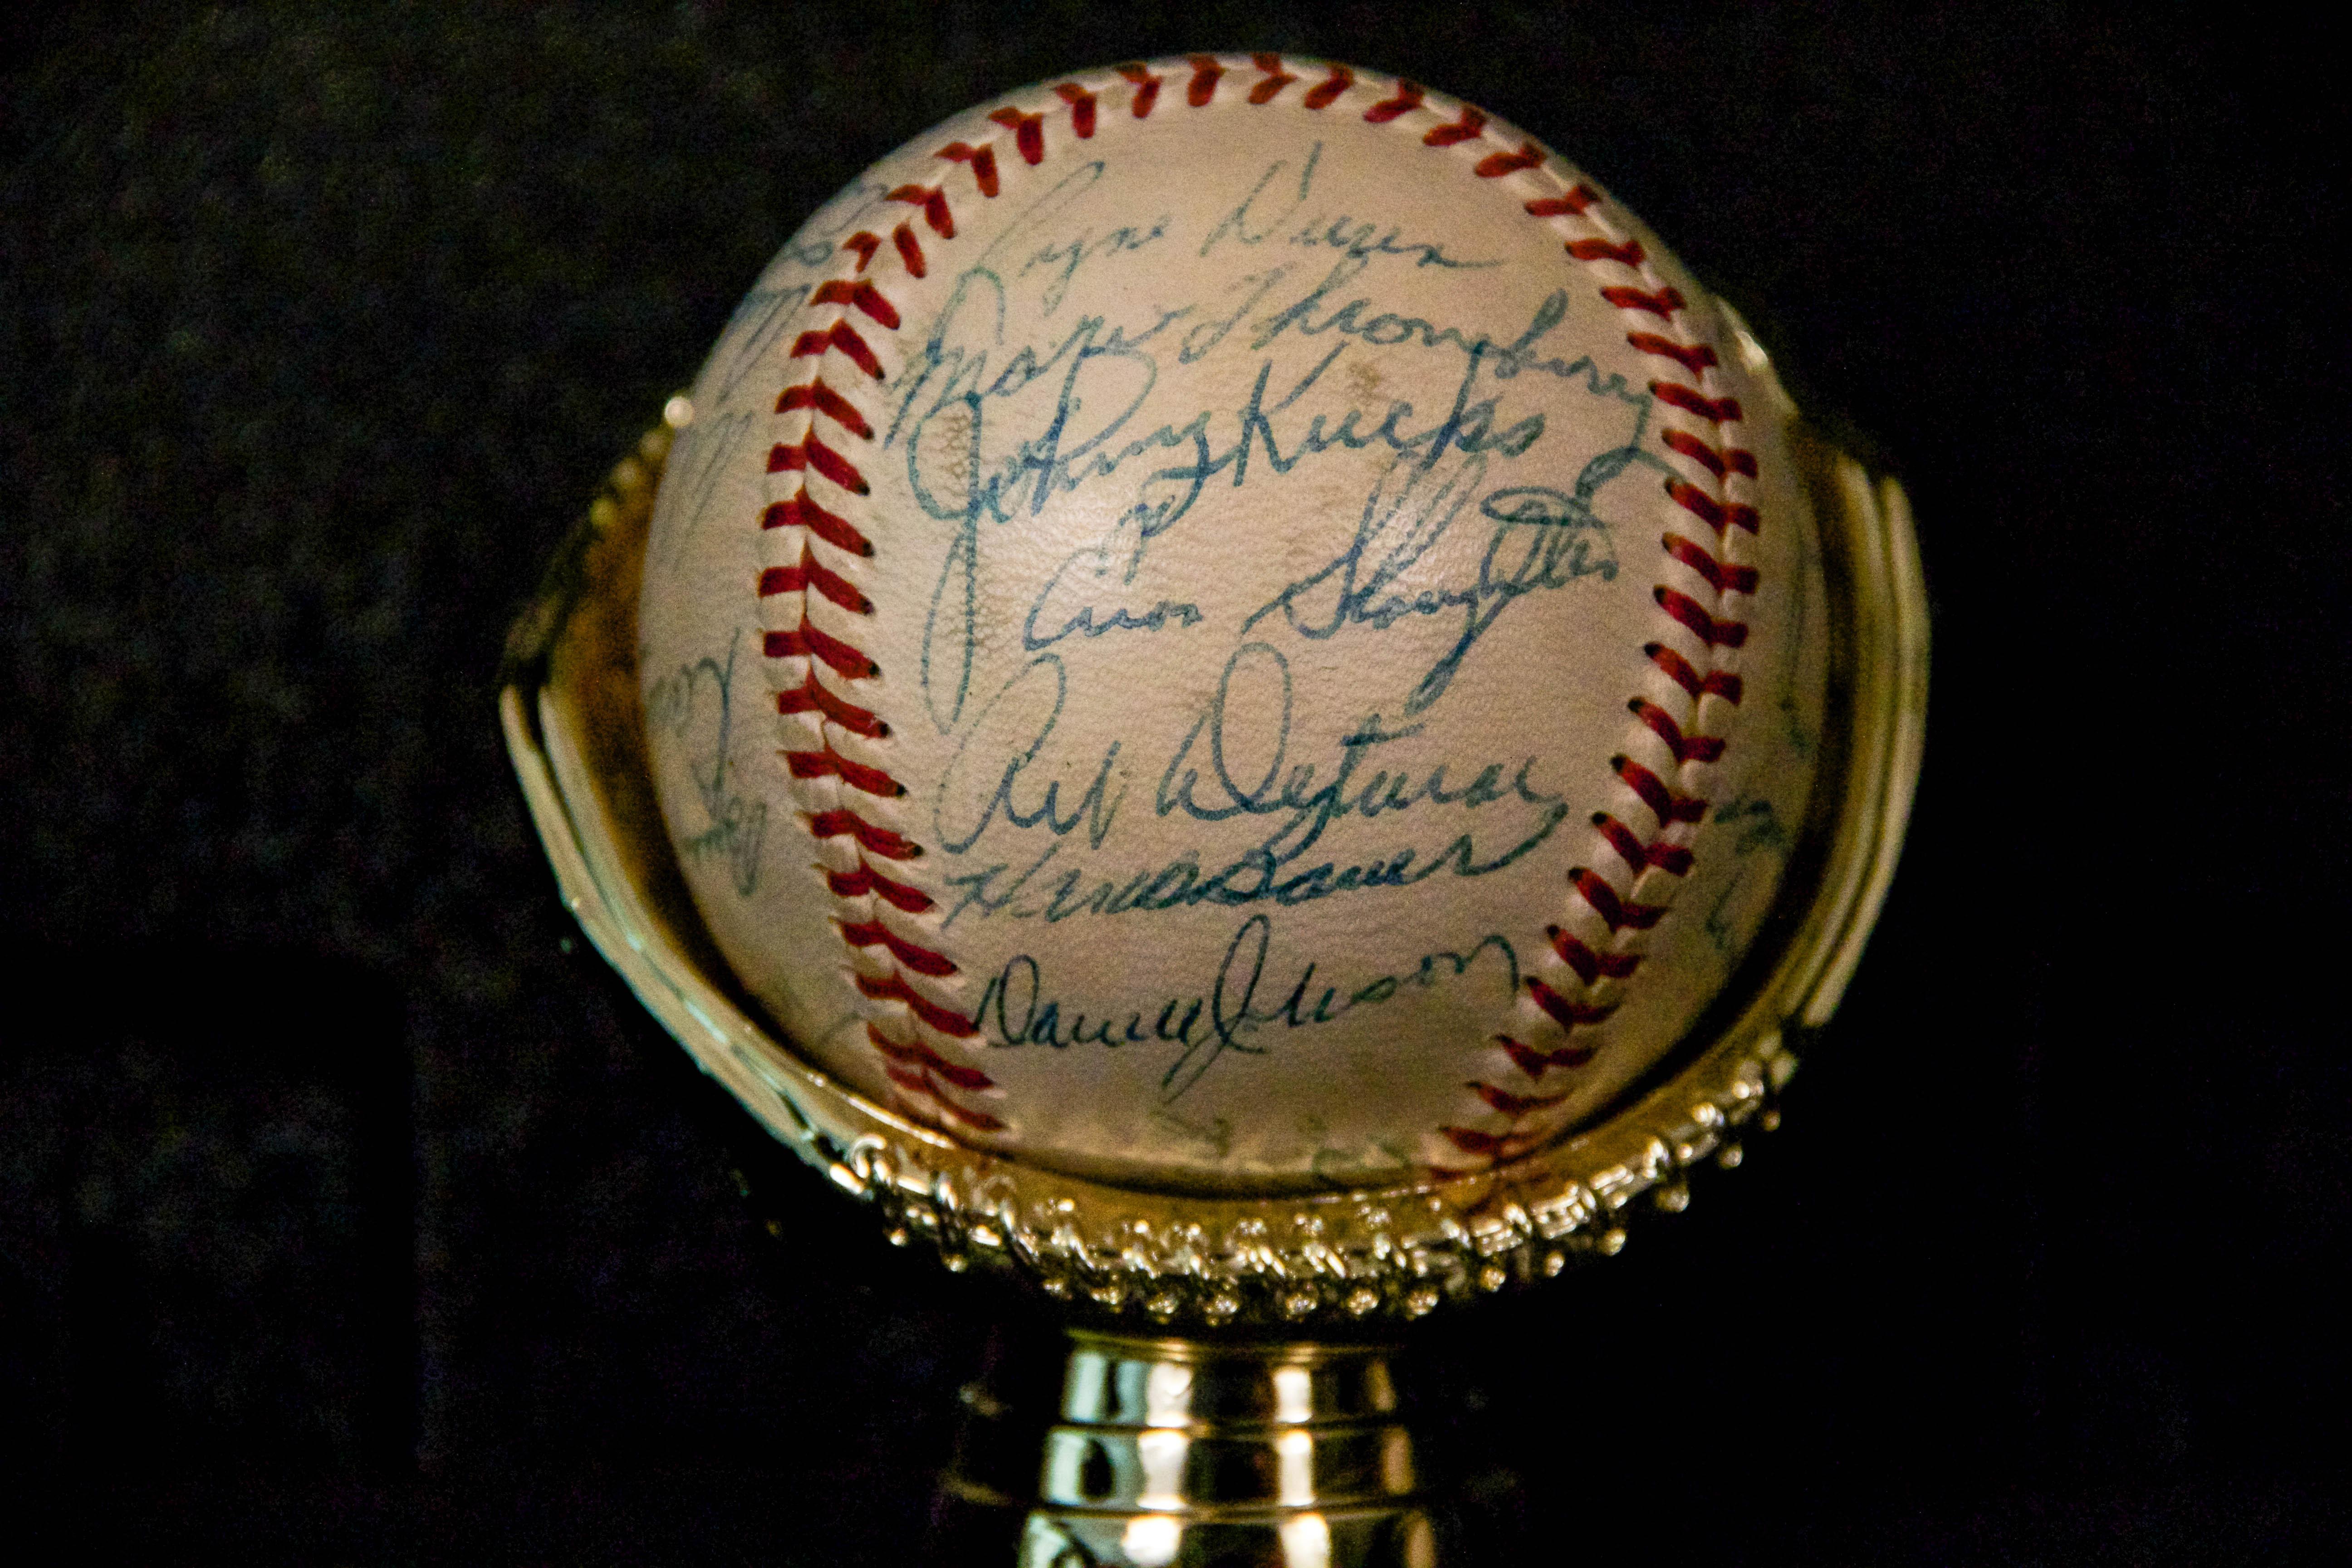 1958 World Series Champions